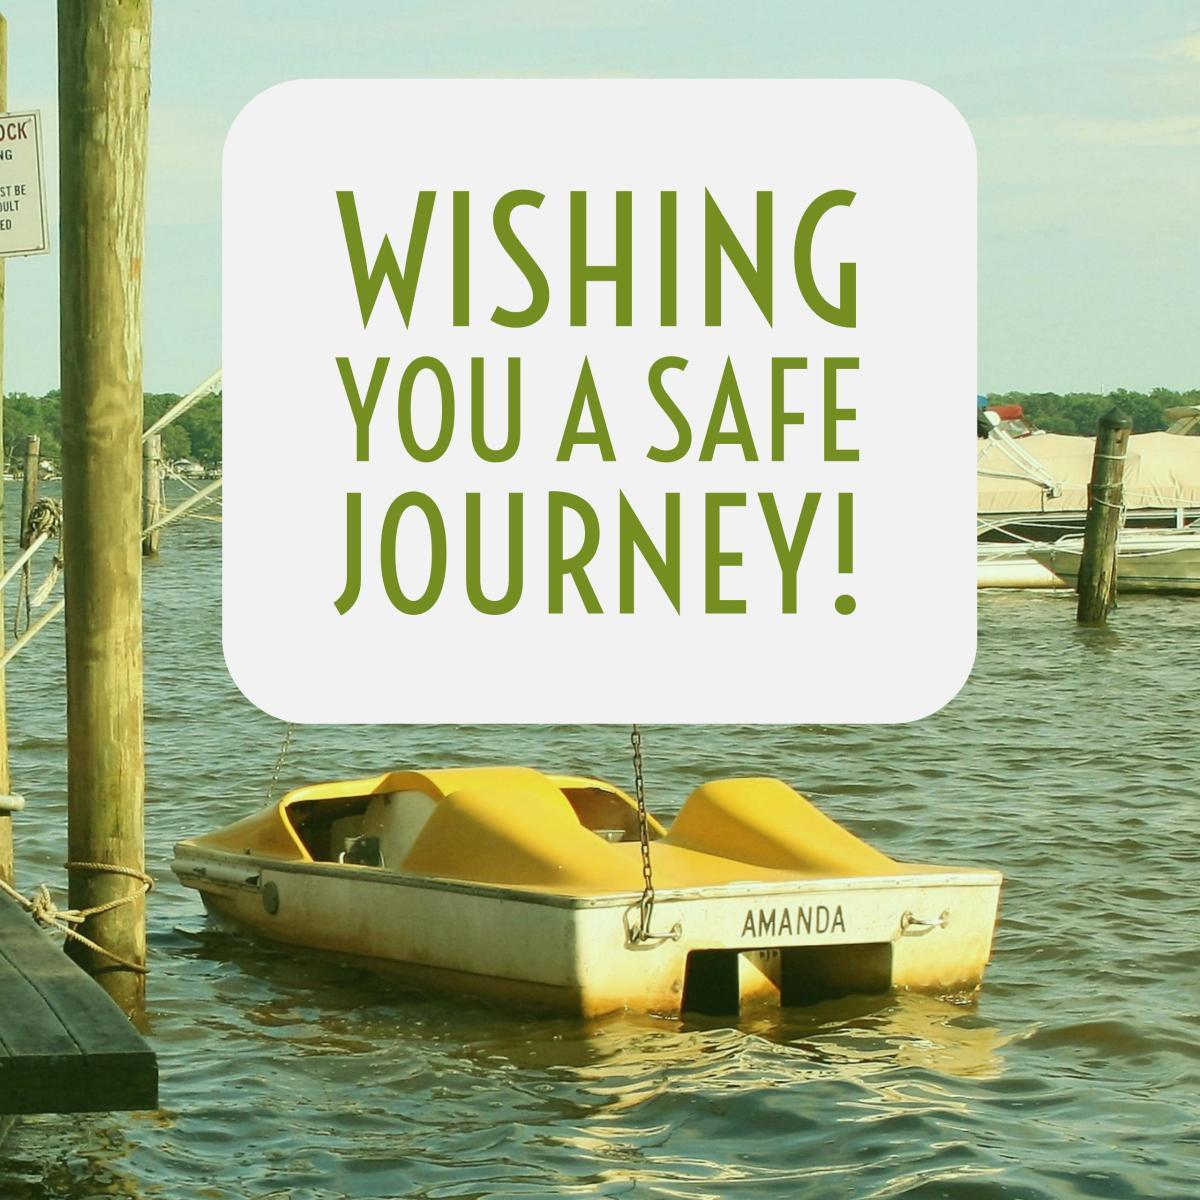 bon-voyage-messages-have-a-safe-trip-wishes